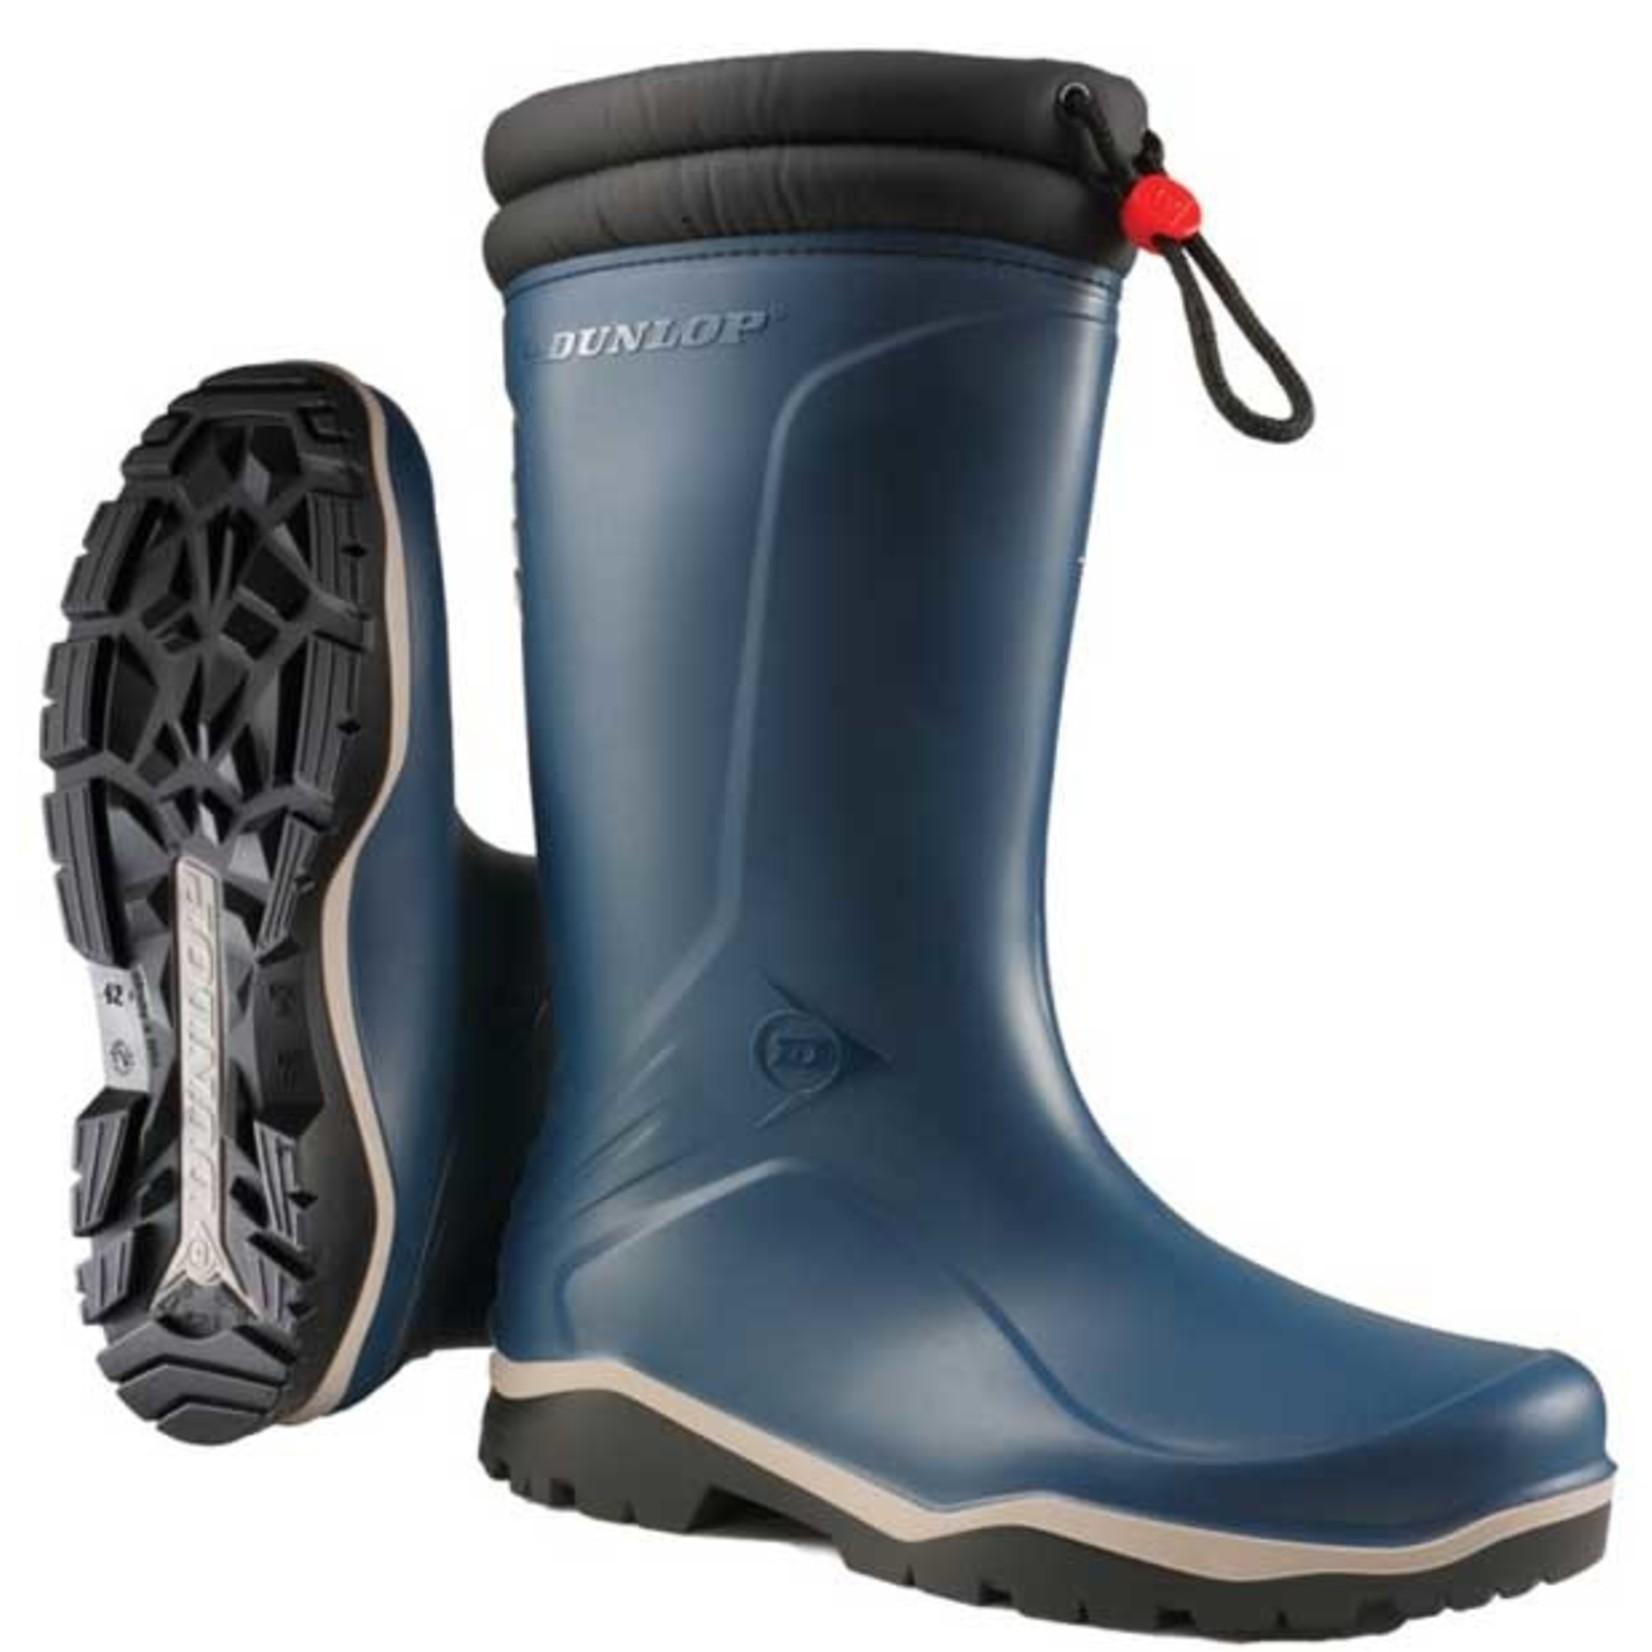 Dunlop Dunlop K454061 winterlaars onbeveiligd